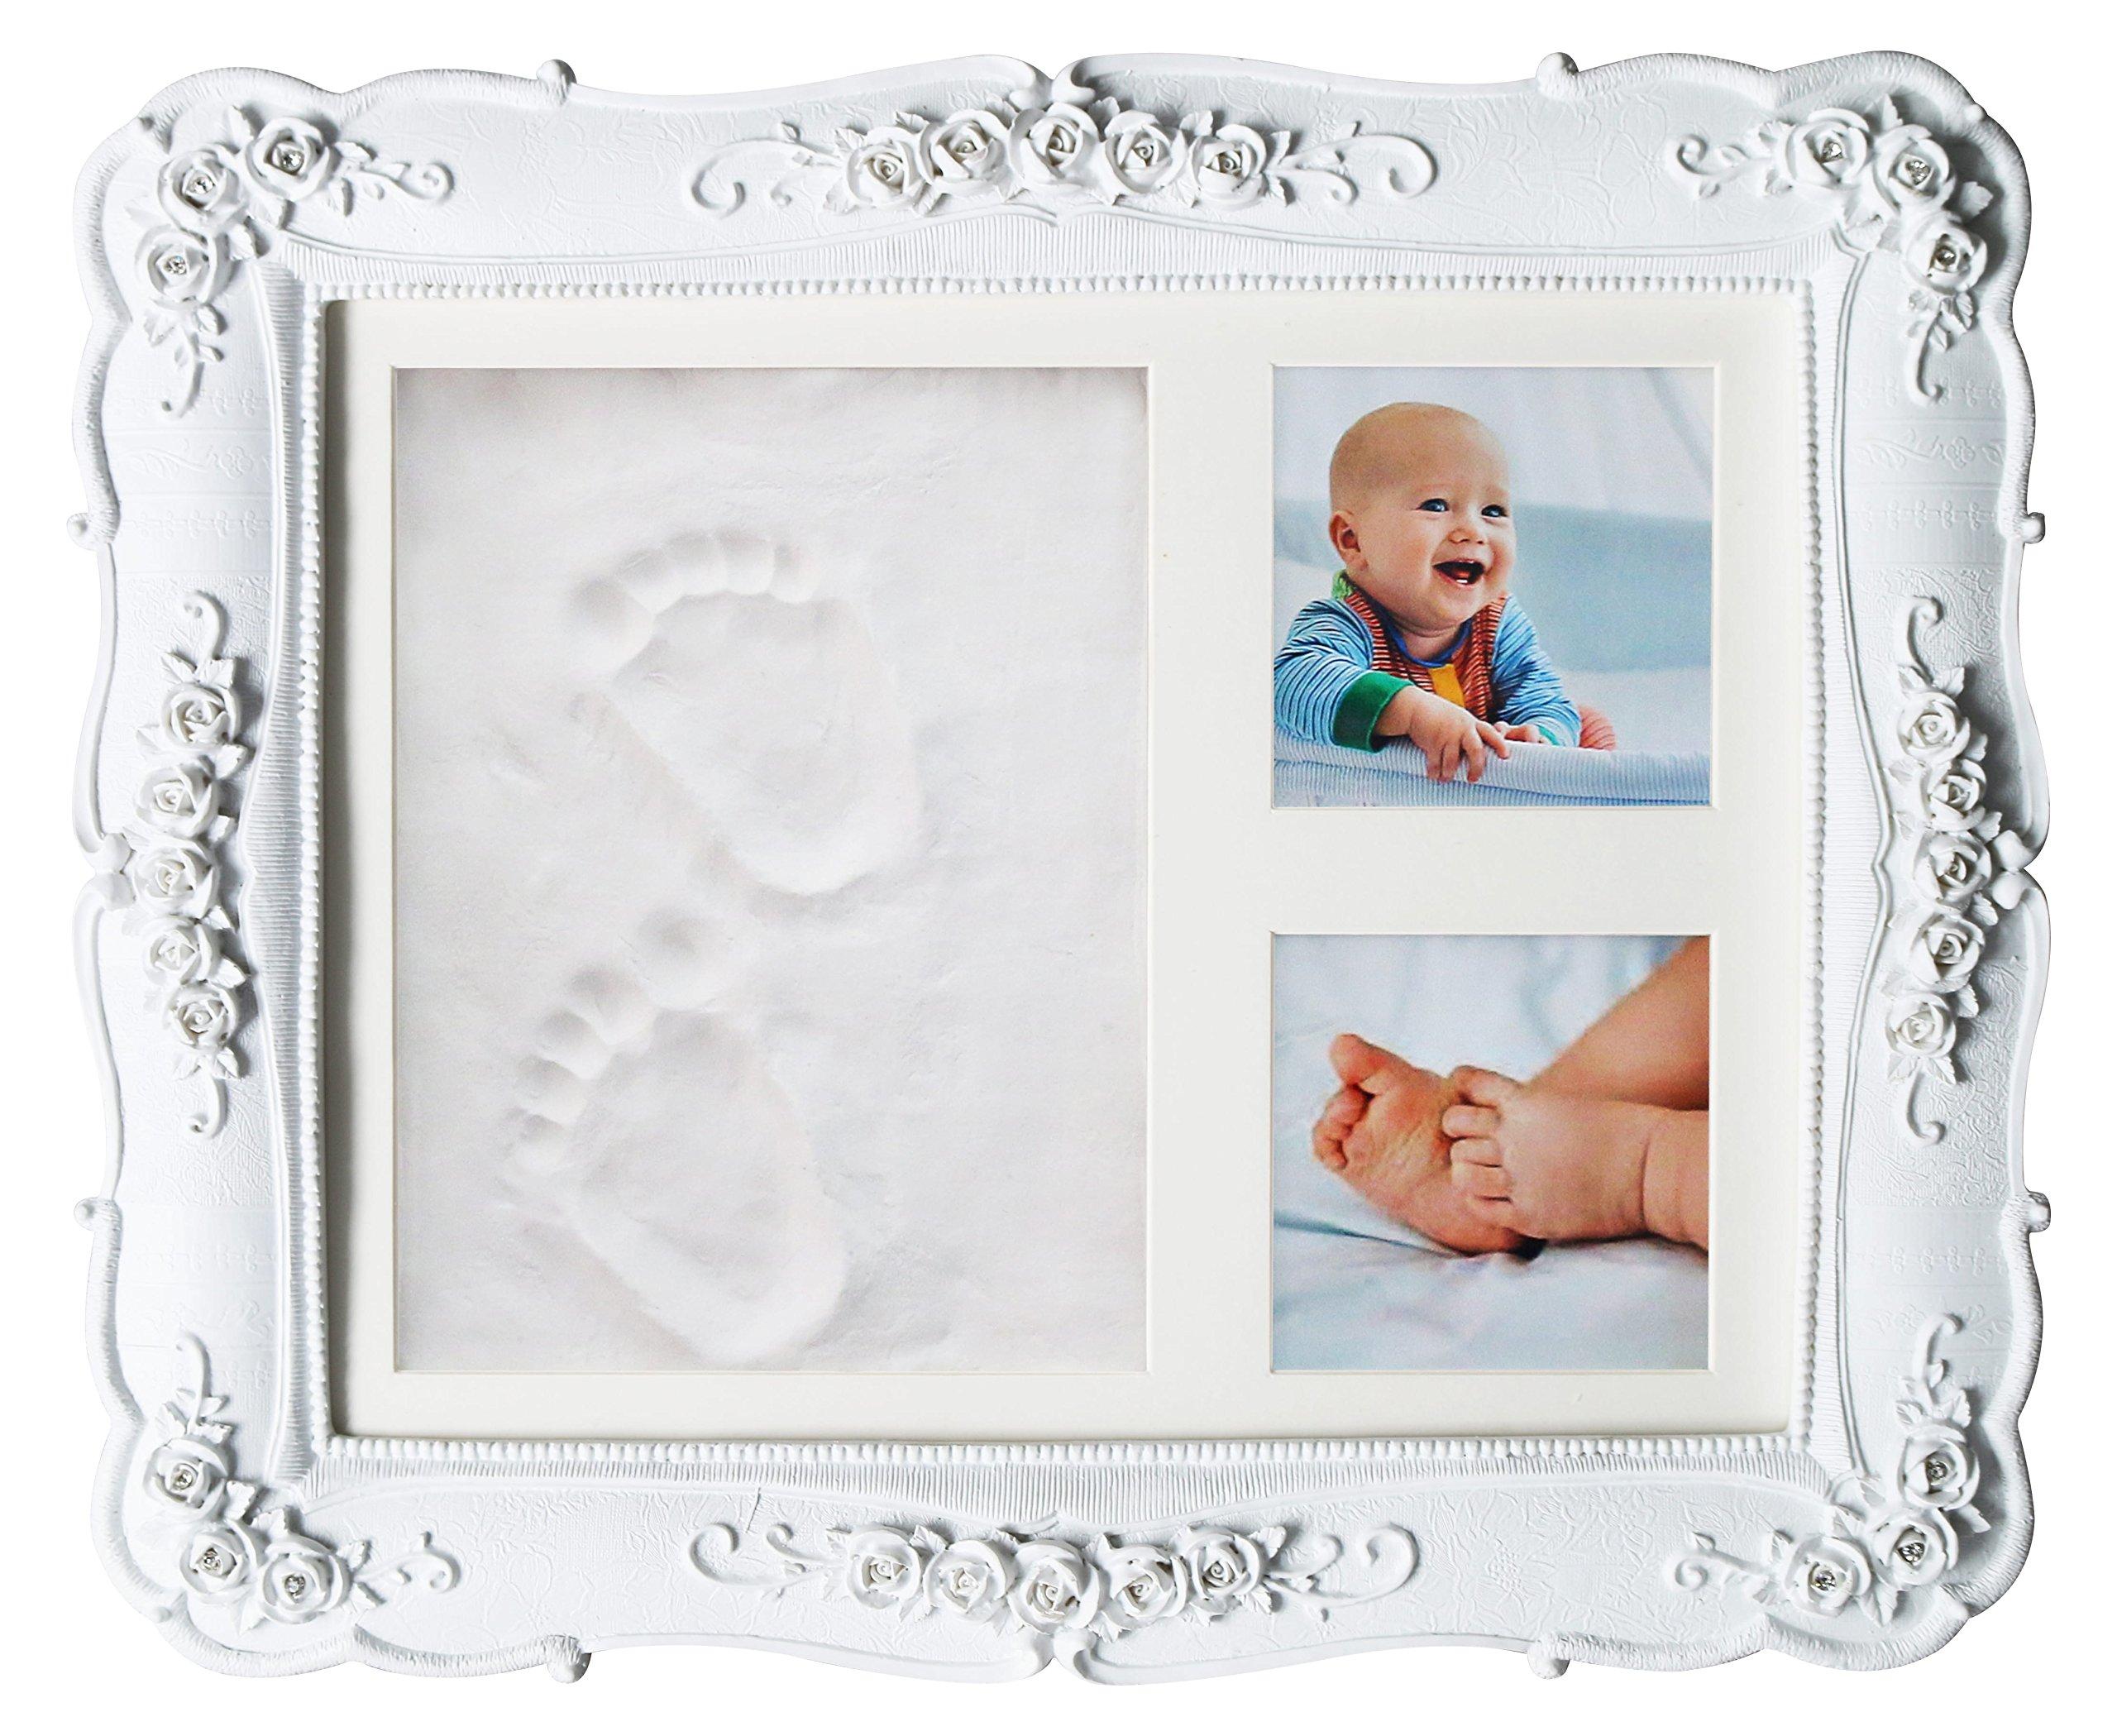 Unique Baby Shower Handprint Footprint Clay kit Frame for Newborns ...